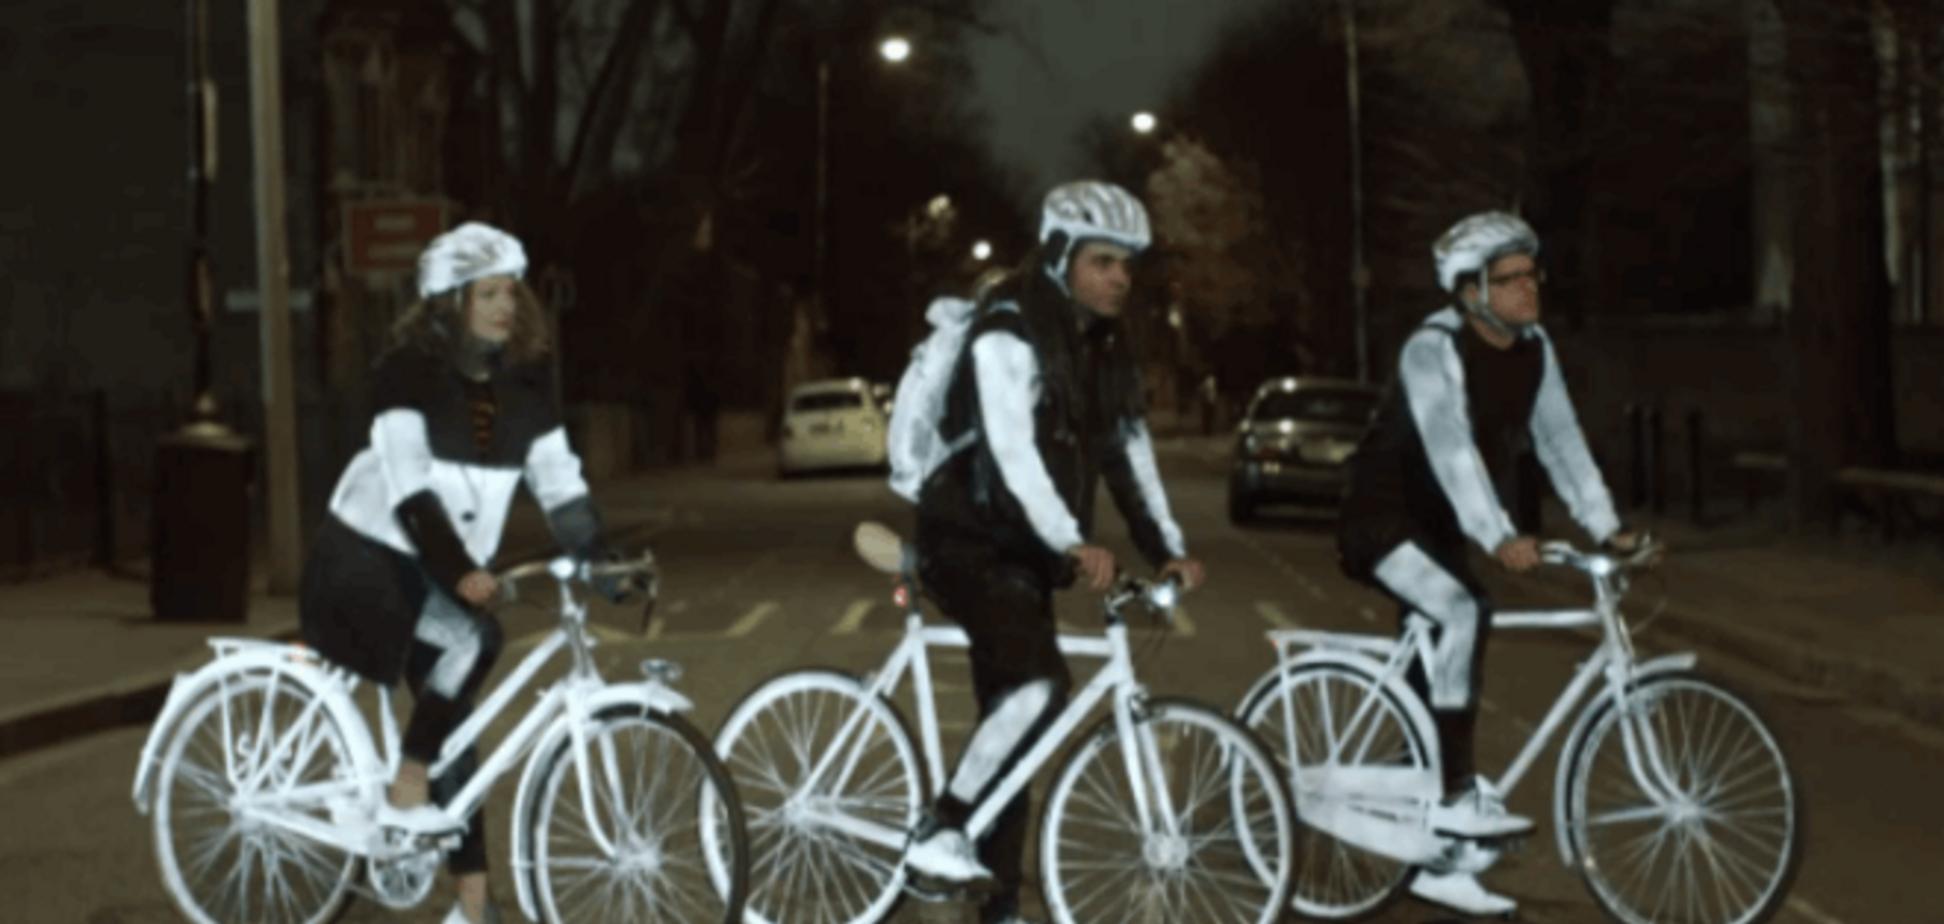 Volvo представила невидимую краску LifePaint, которая спасет жизнь велосипедистам